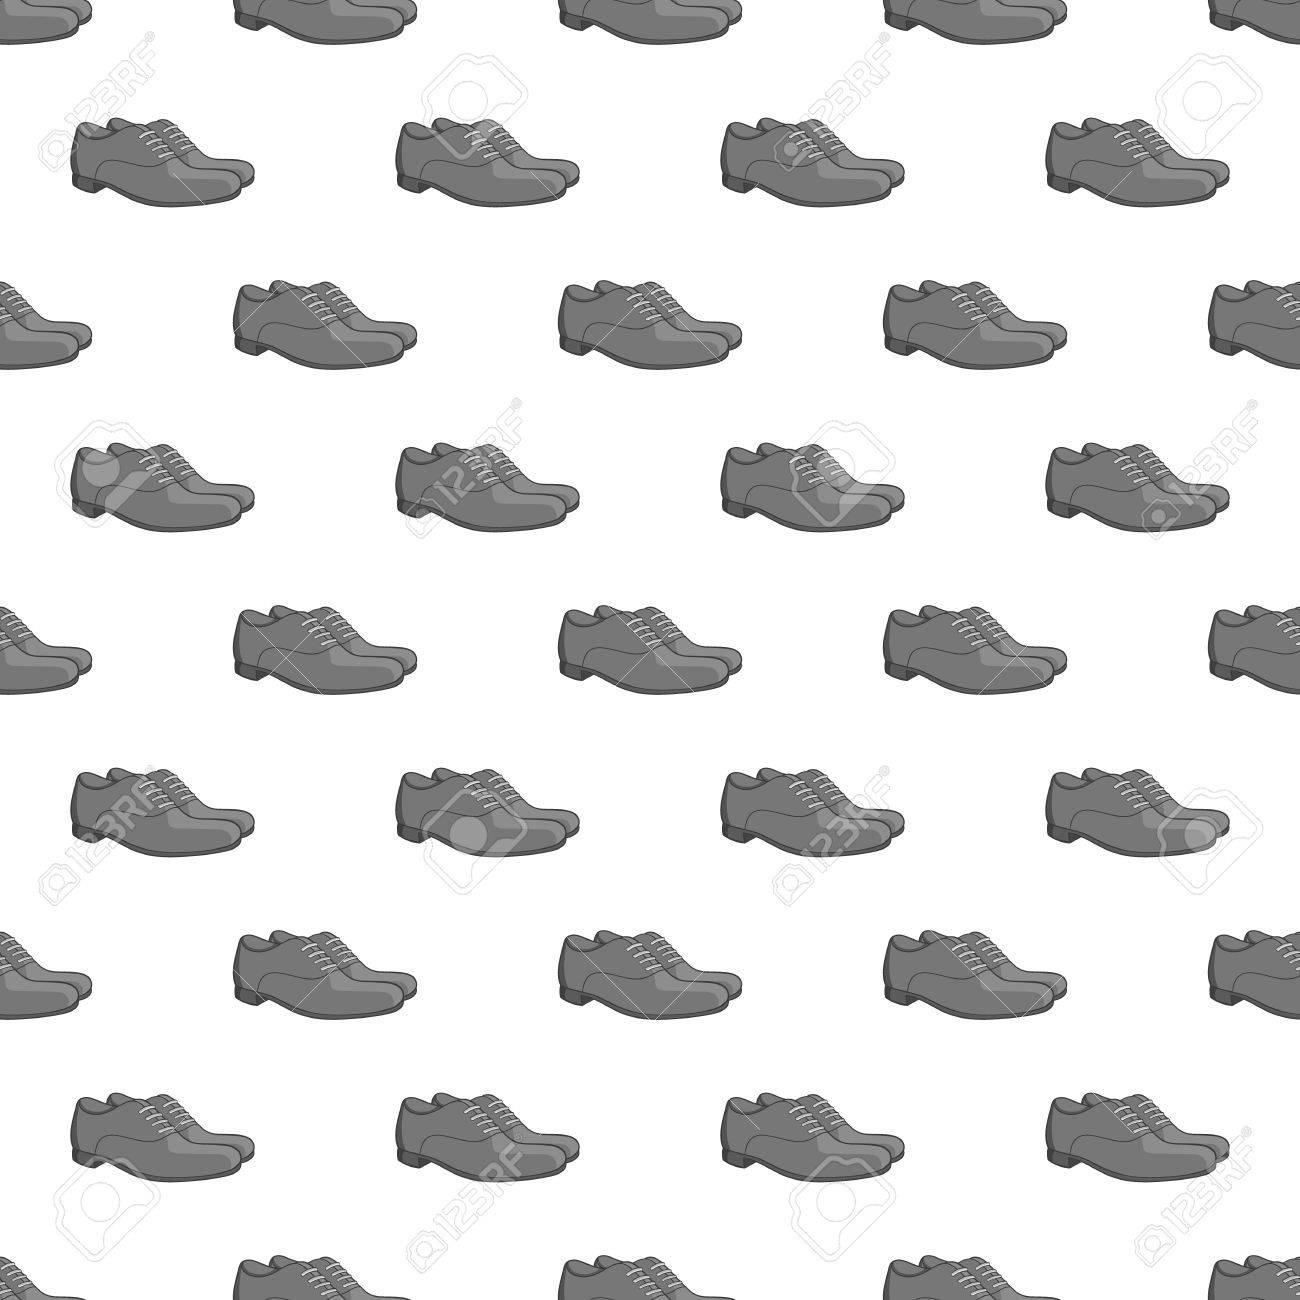 BlancoCalzado Ilustración Para De Zapatos Patrón Diseño Hombre Transparente Sobre Vectorial Fondo fvb76yYg